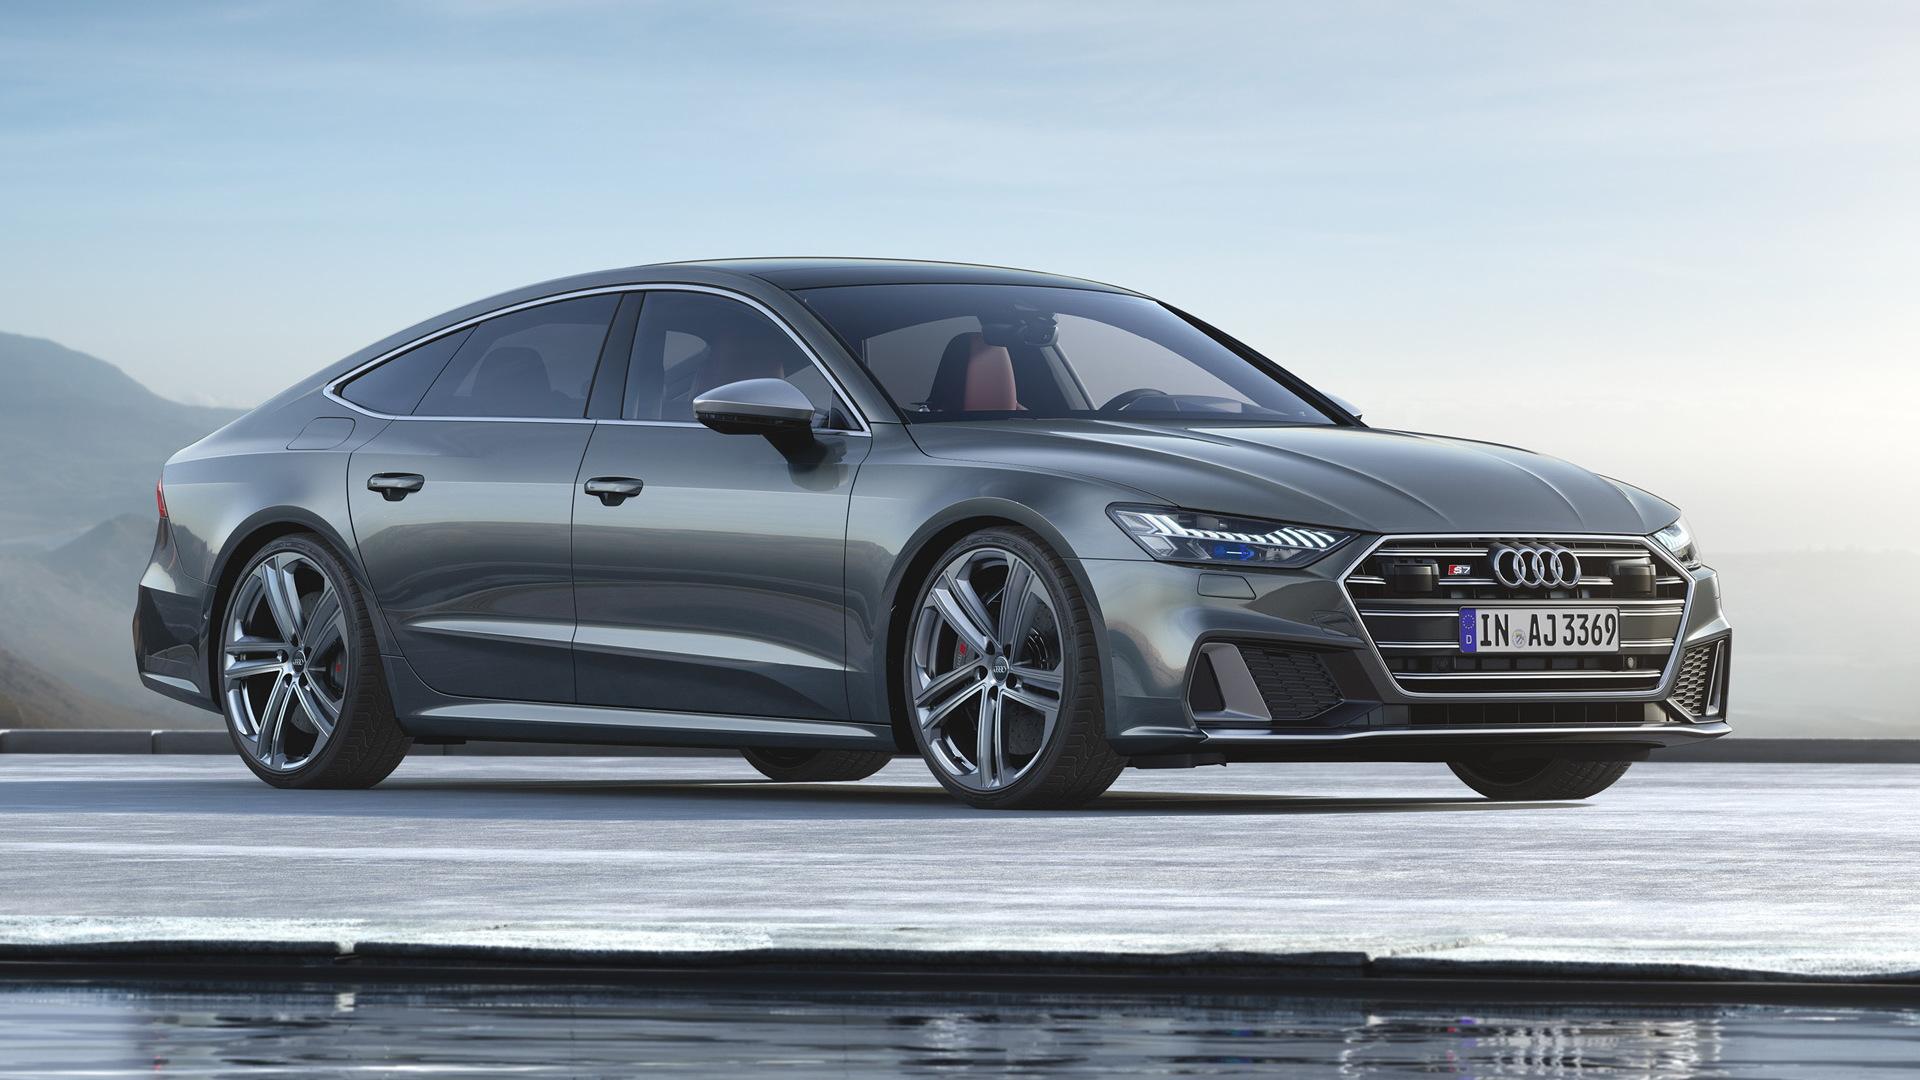 New Audi S7 Sportback